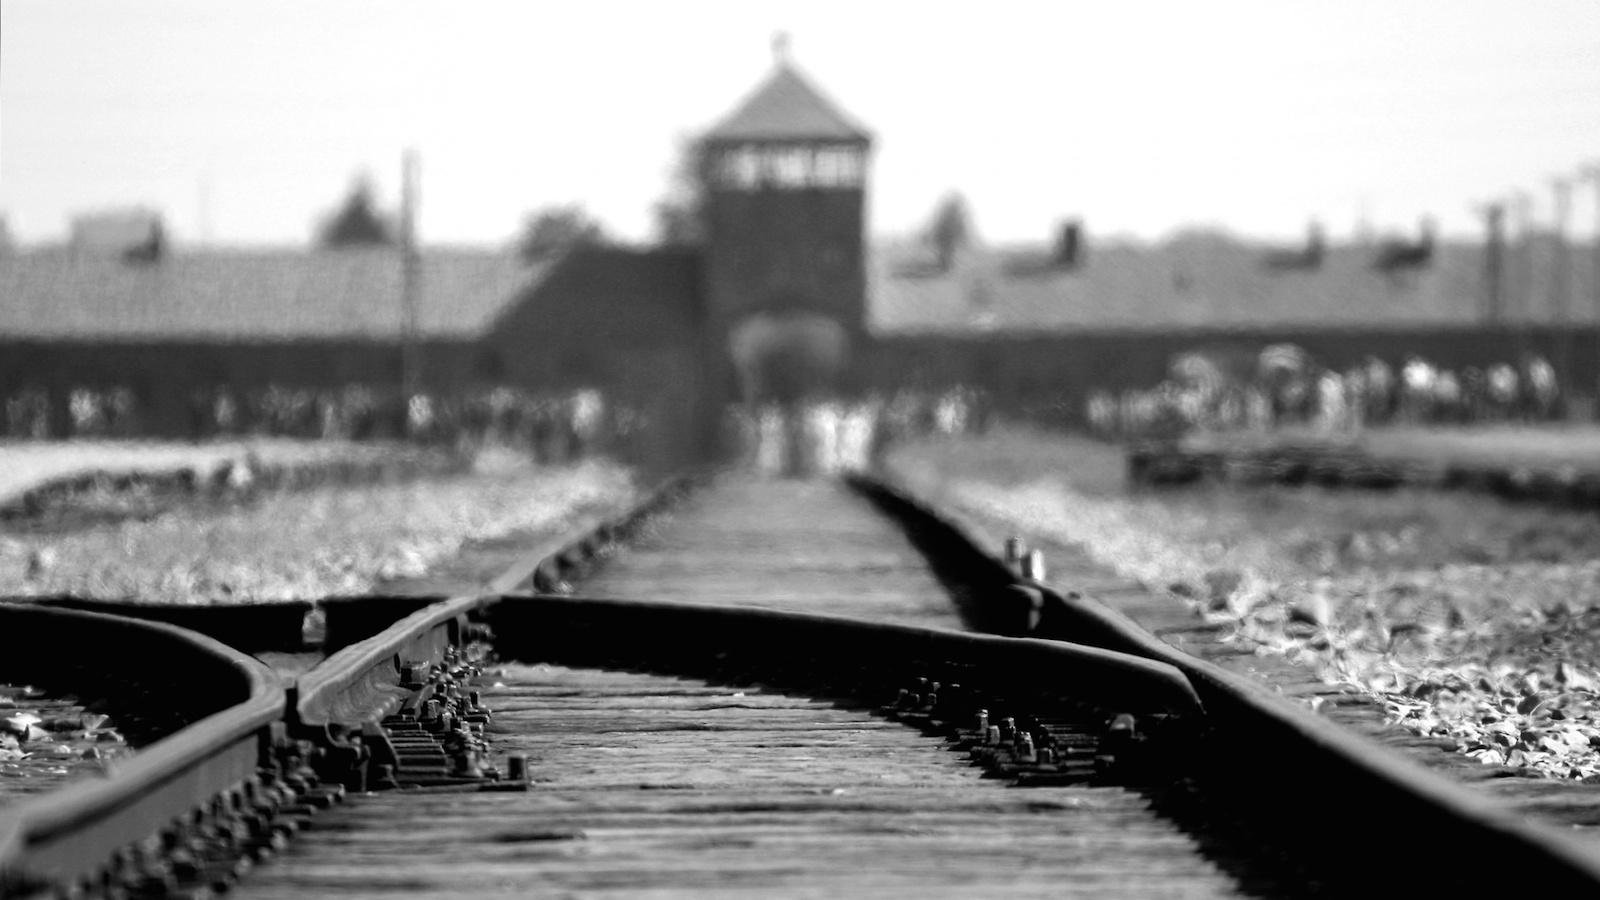 A day in Auschwitz II - Birkenau